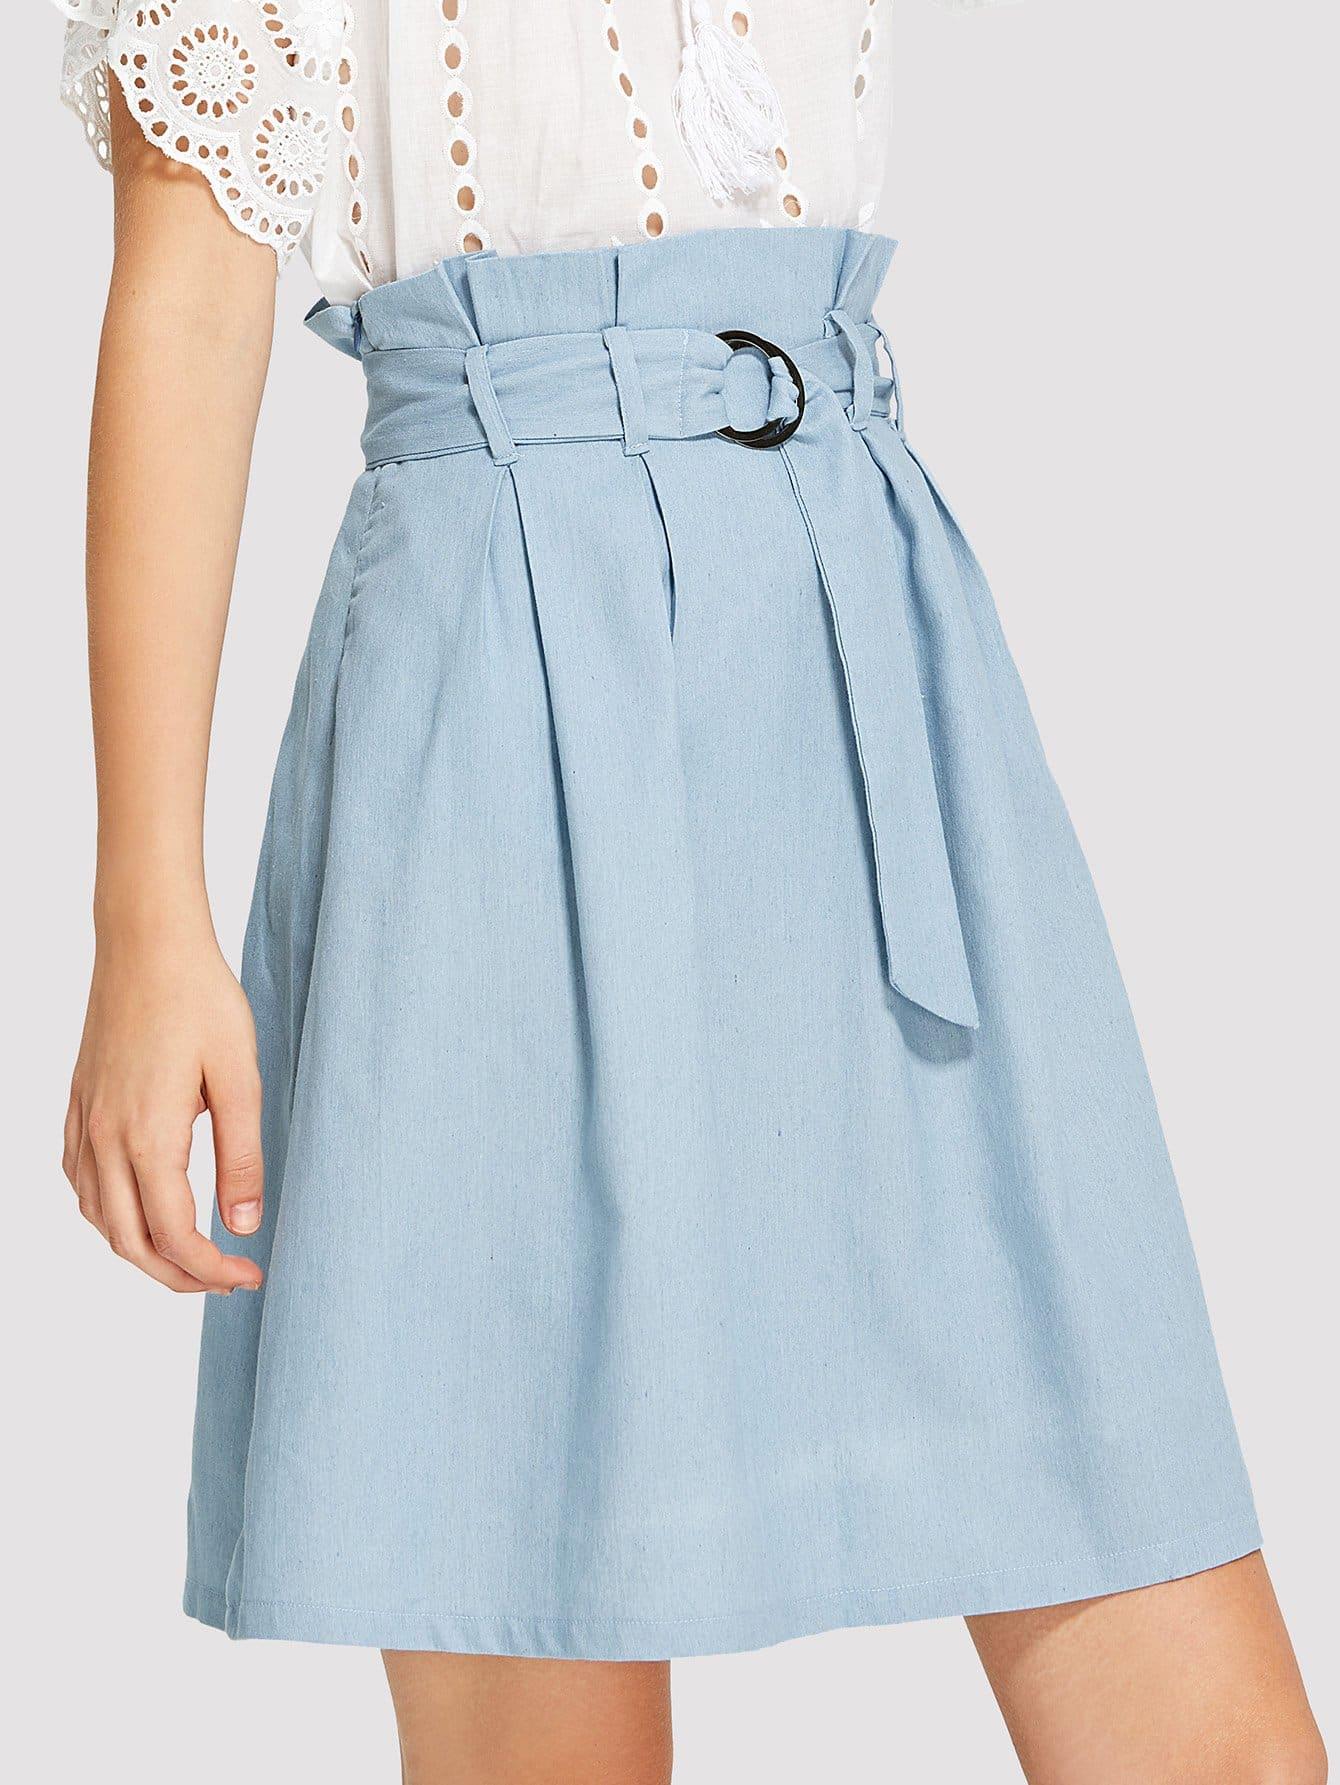 Self Tie Waist Skirt